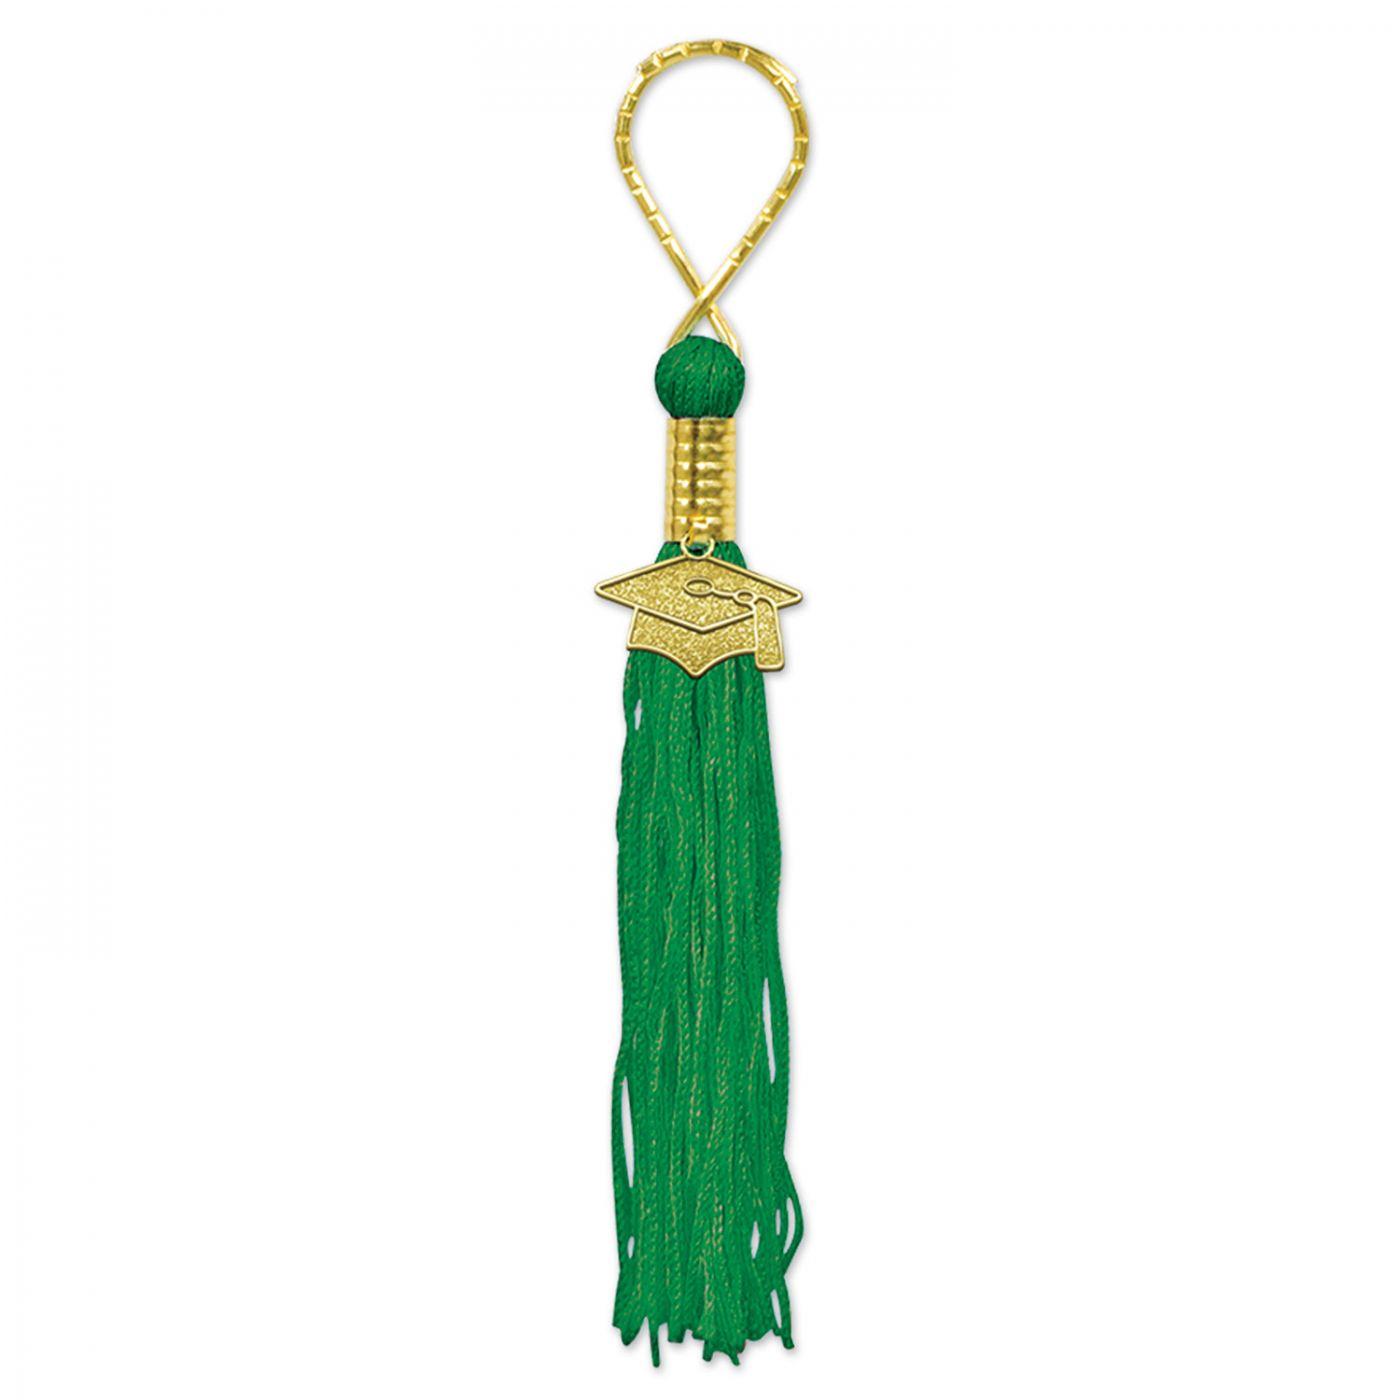 Green Tassel Keychain (6) image